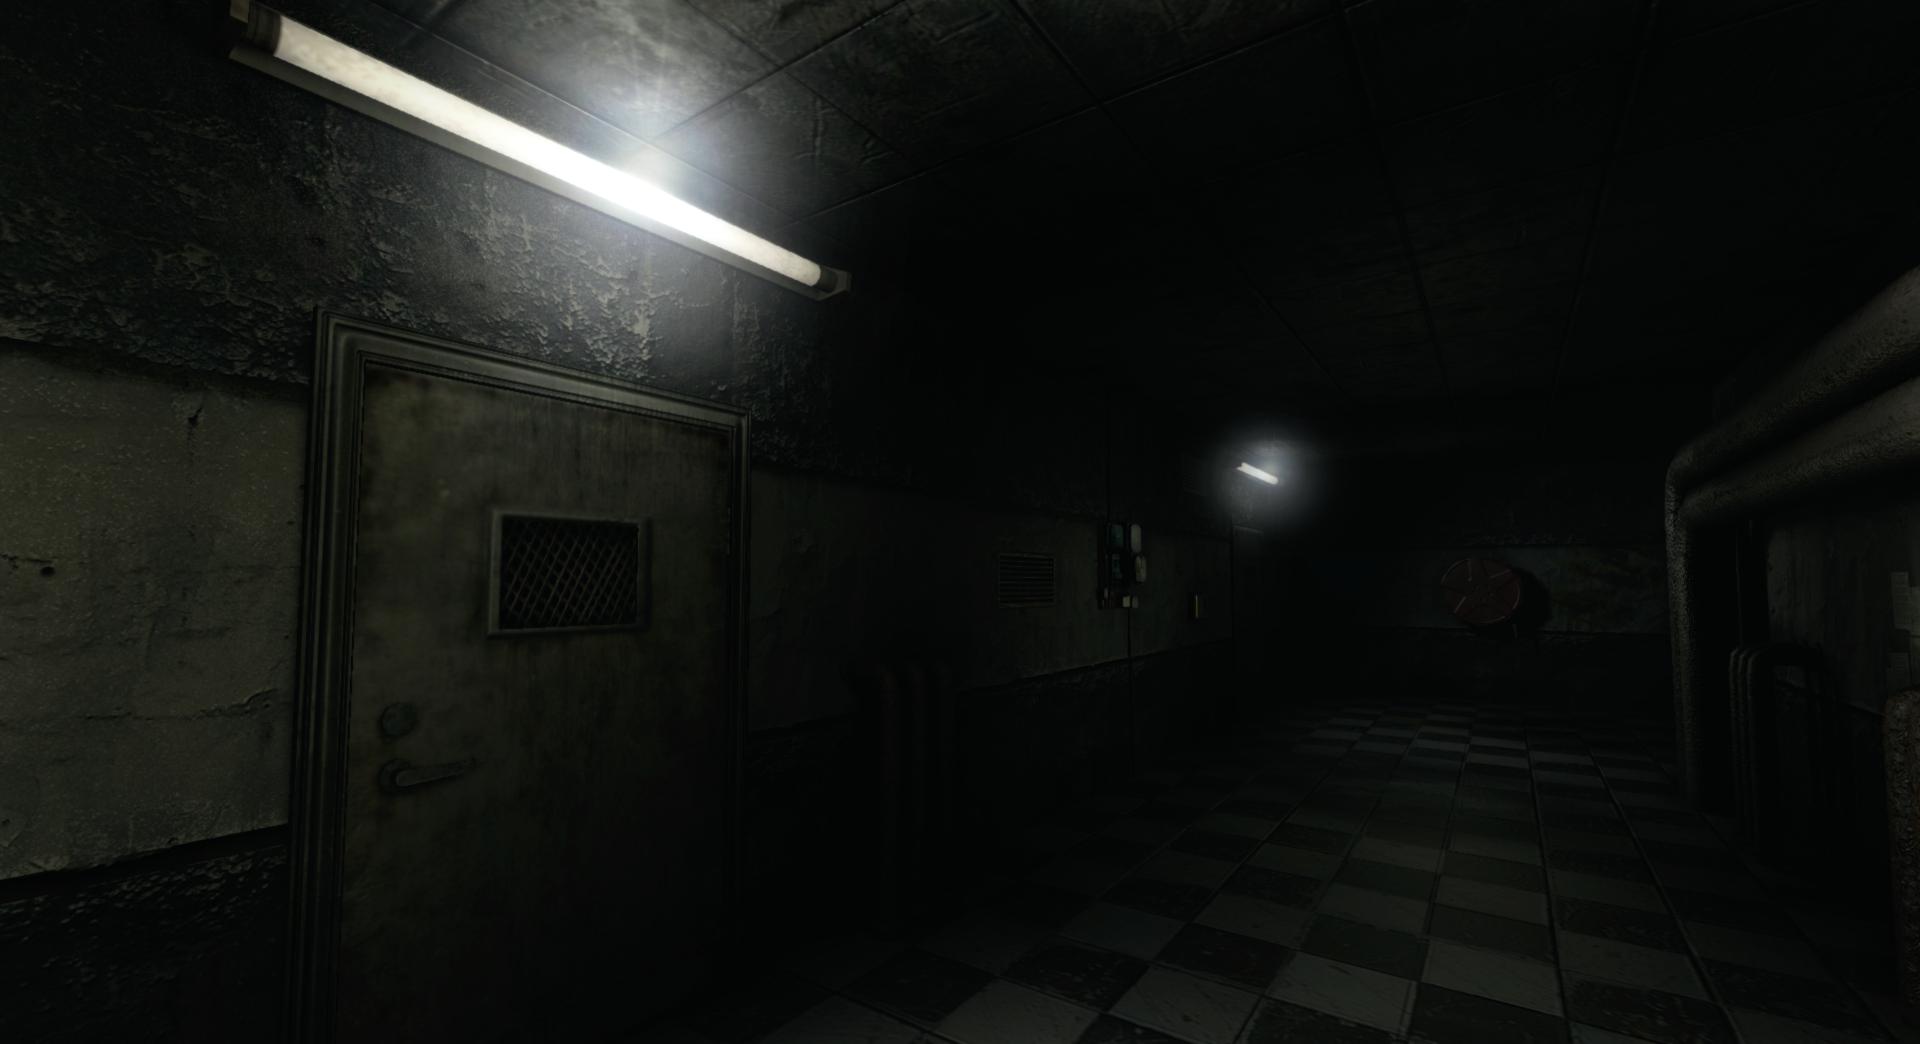 Black Plague Image Penumbra Decline Mod For Amnesia The Dark